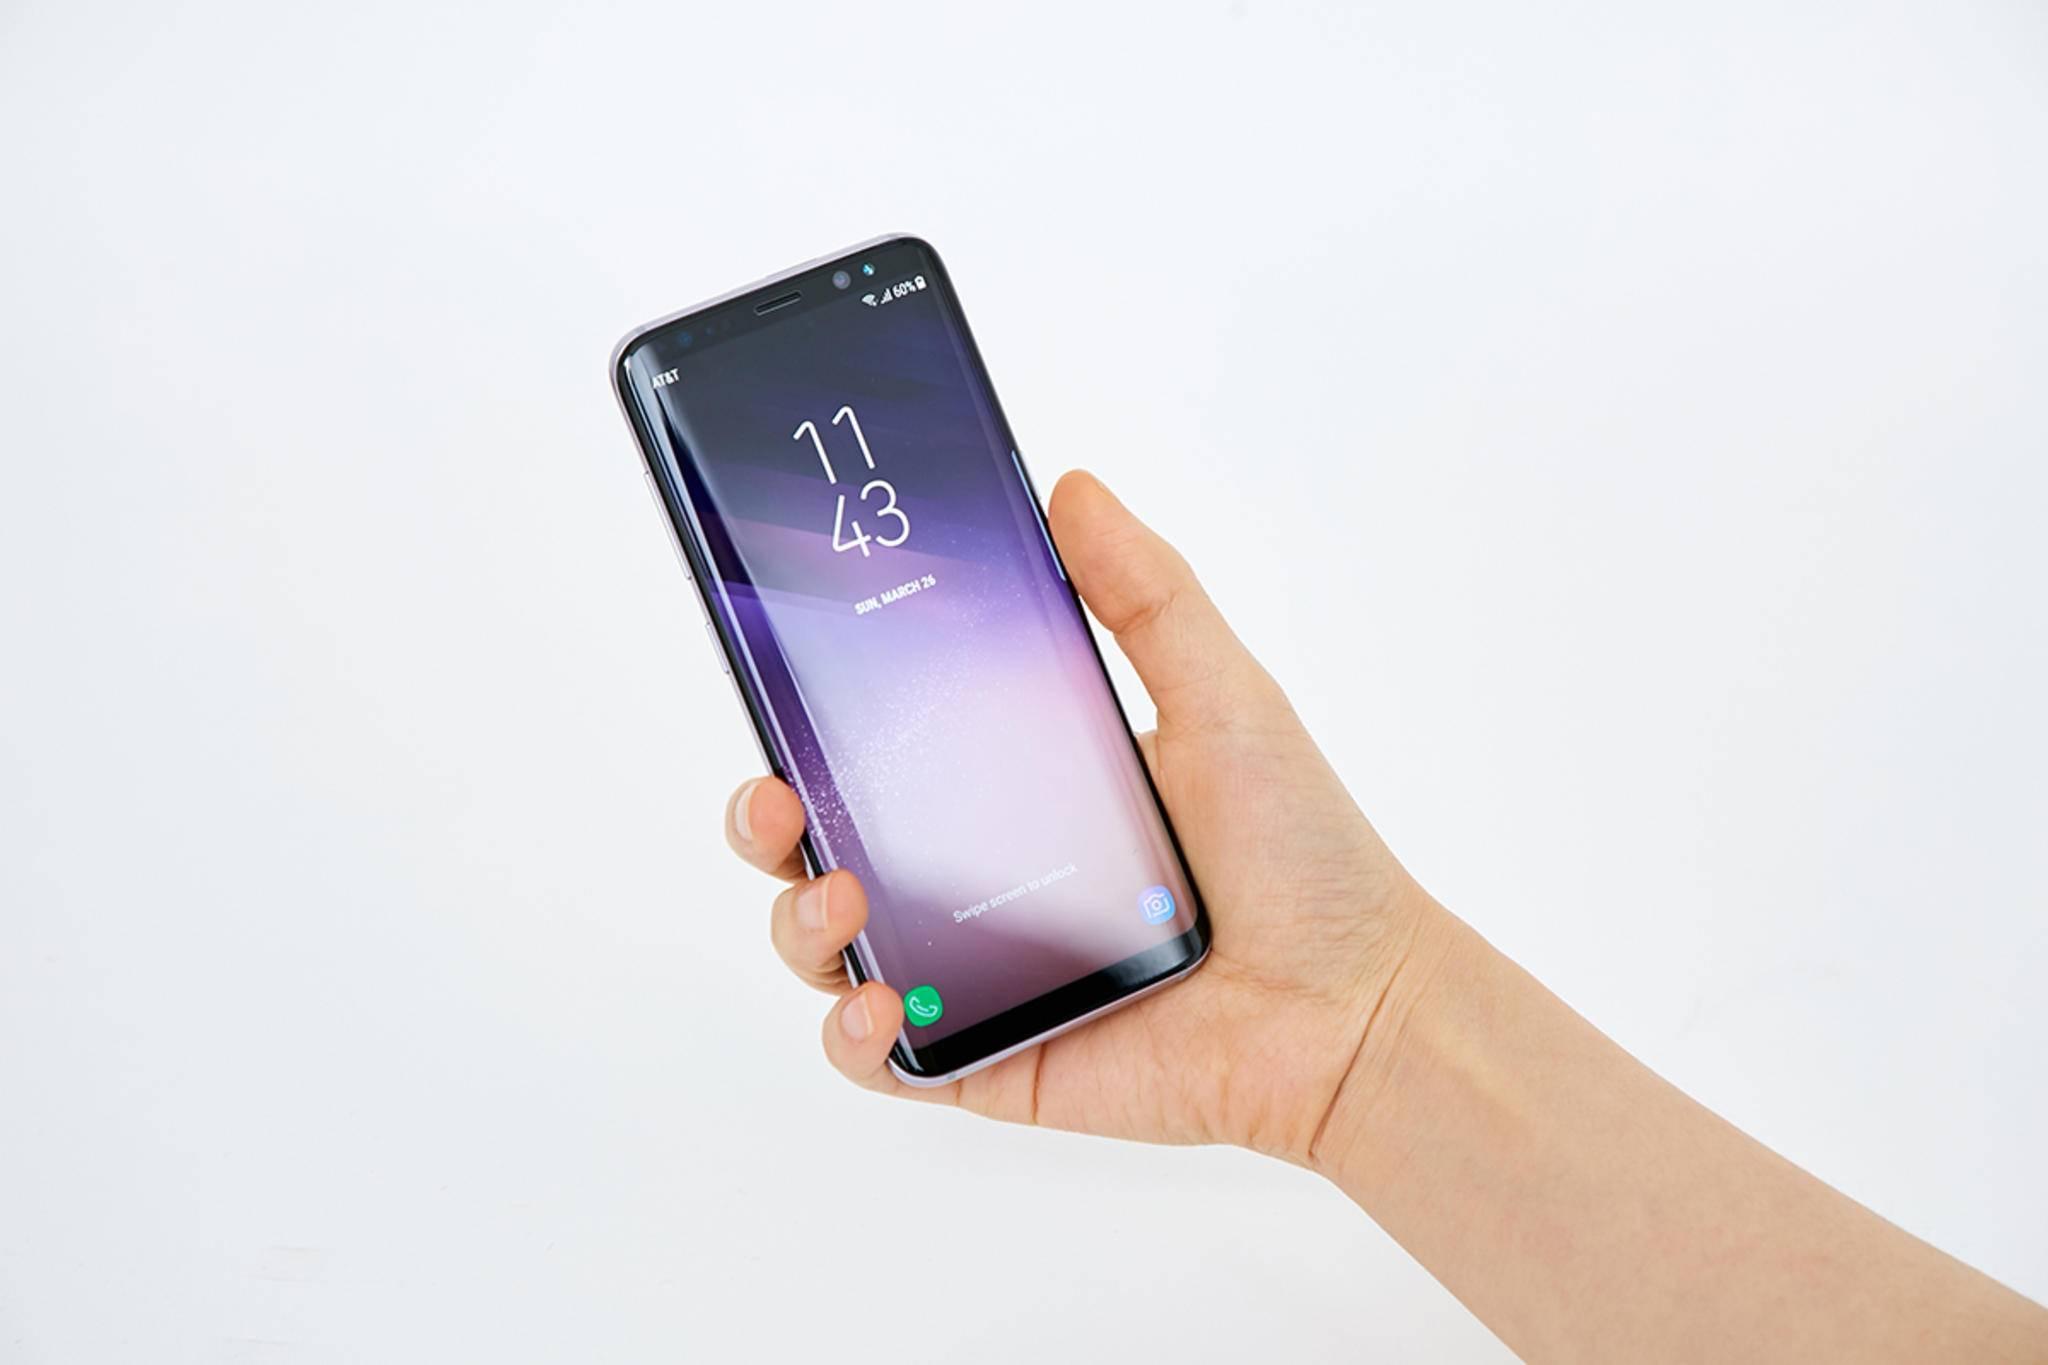 Am 28. April erscheint das Samsung Galaxy S8.